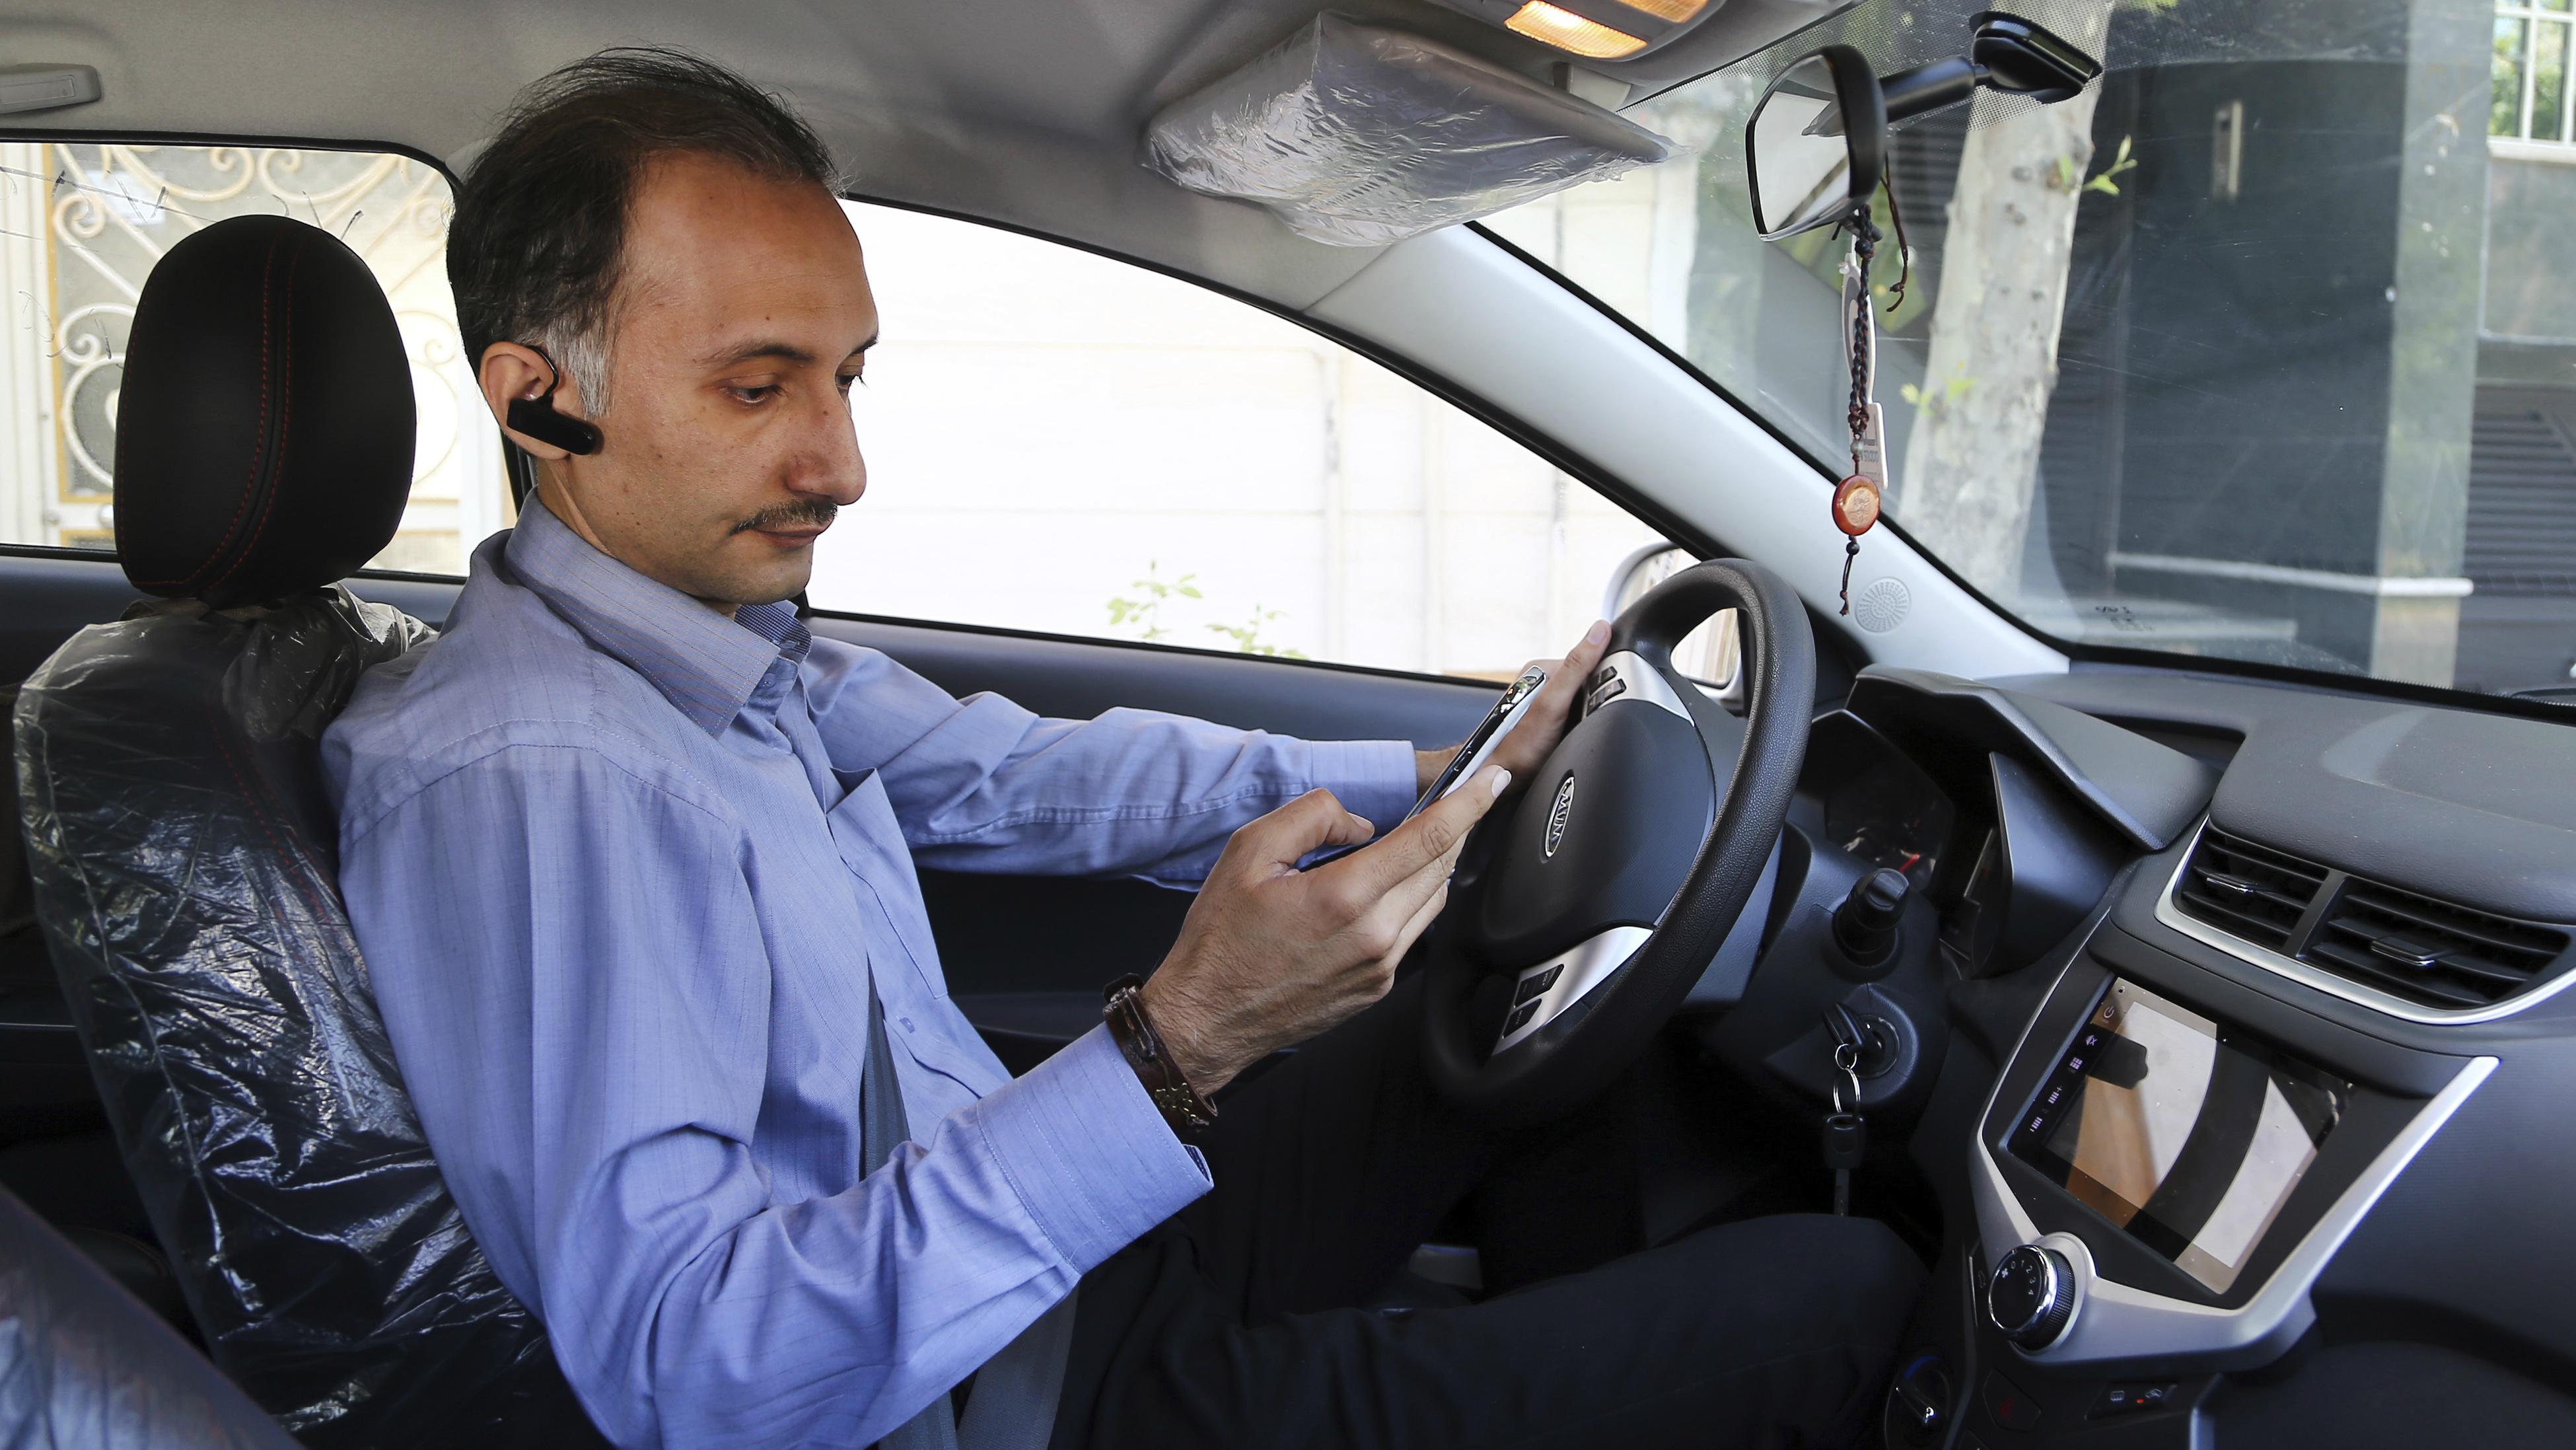 c-snapp-driver-AP_17150468004486-AP Ebrahim Noroozi